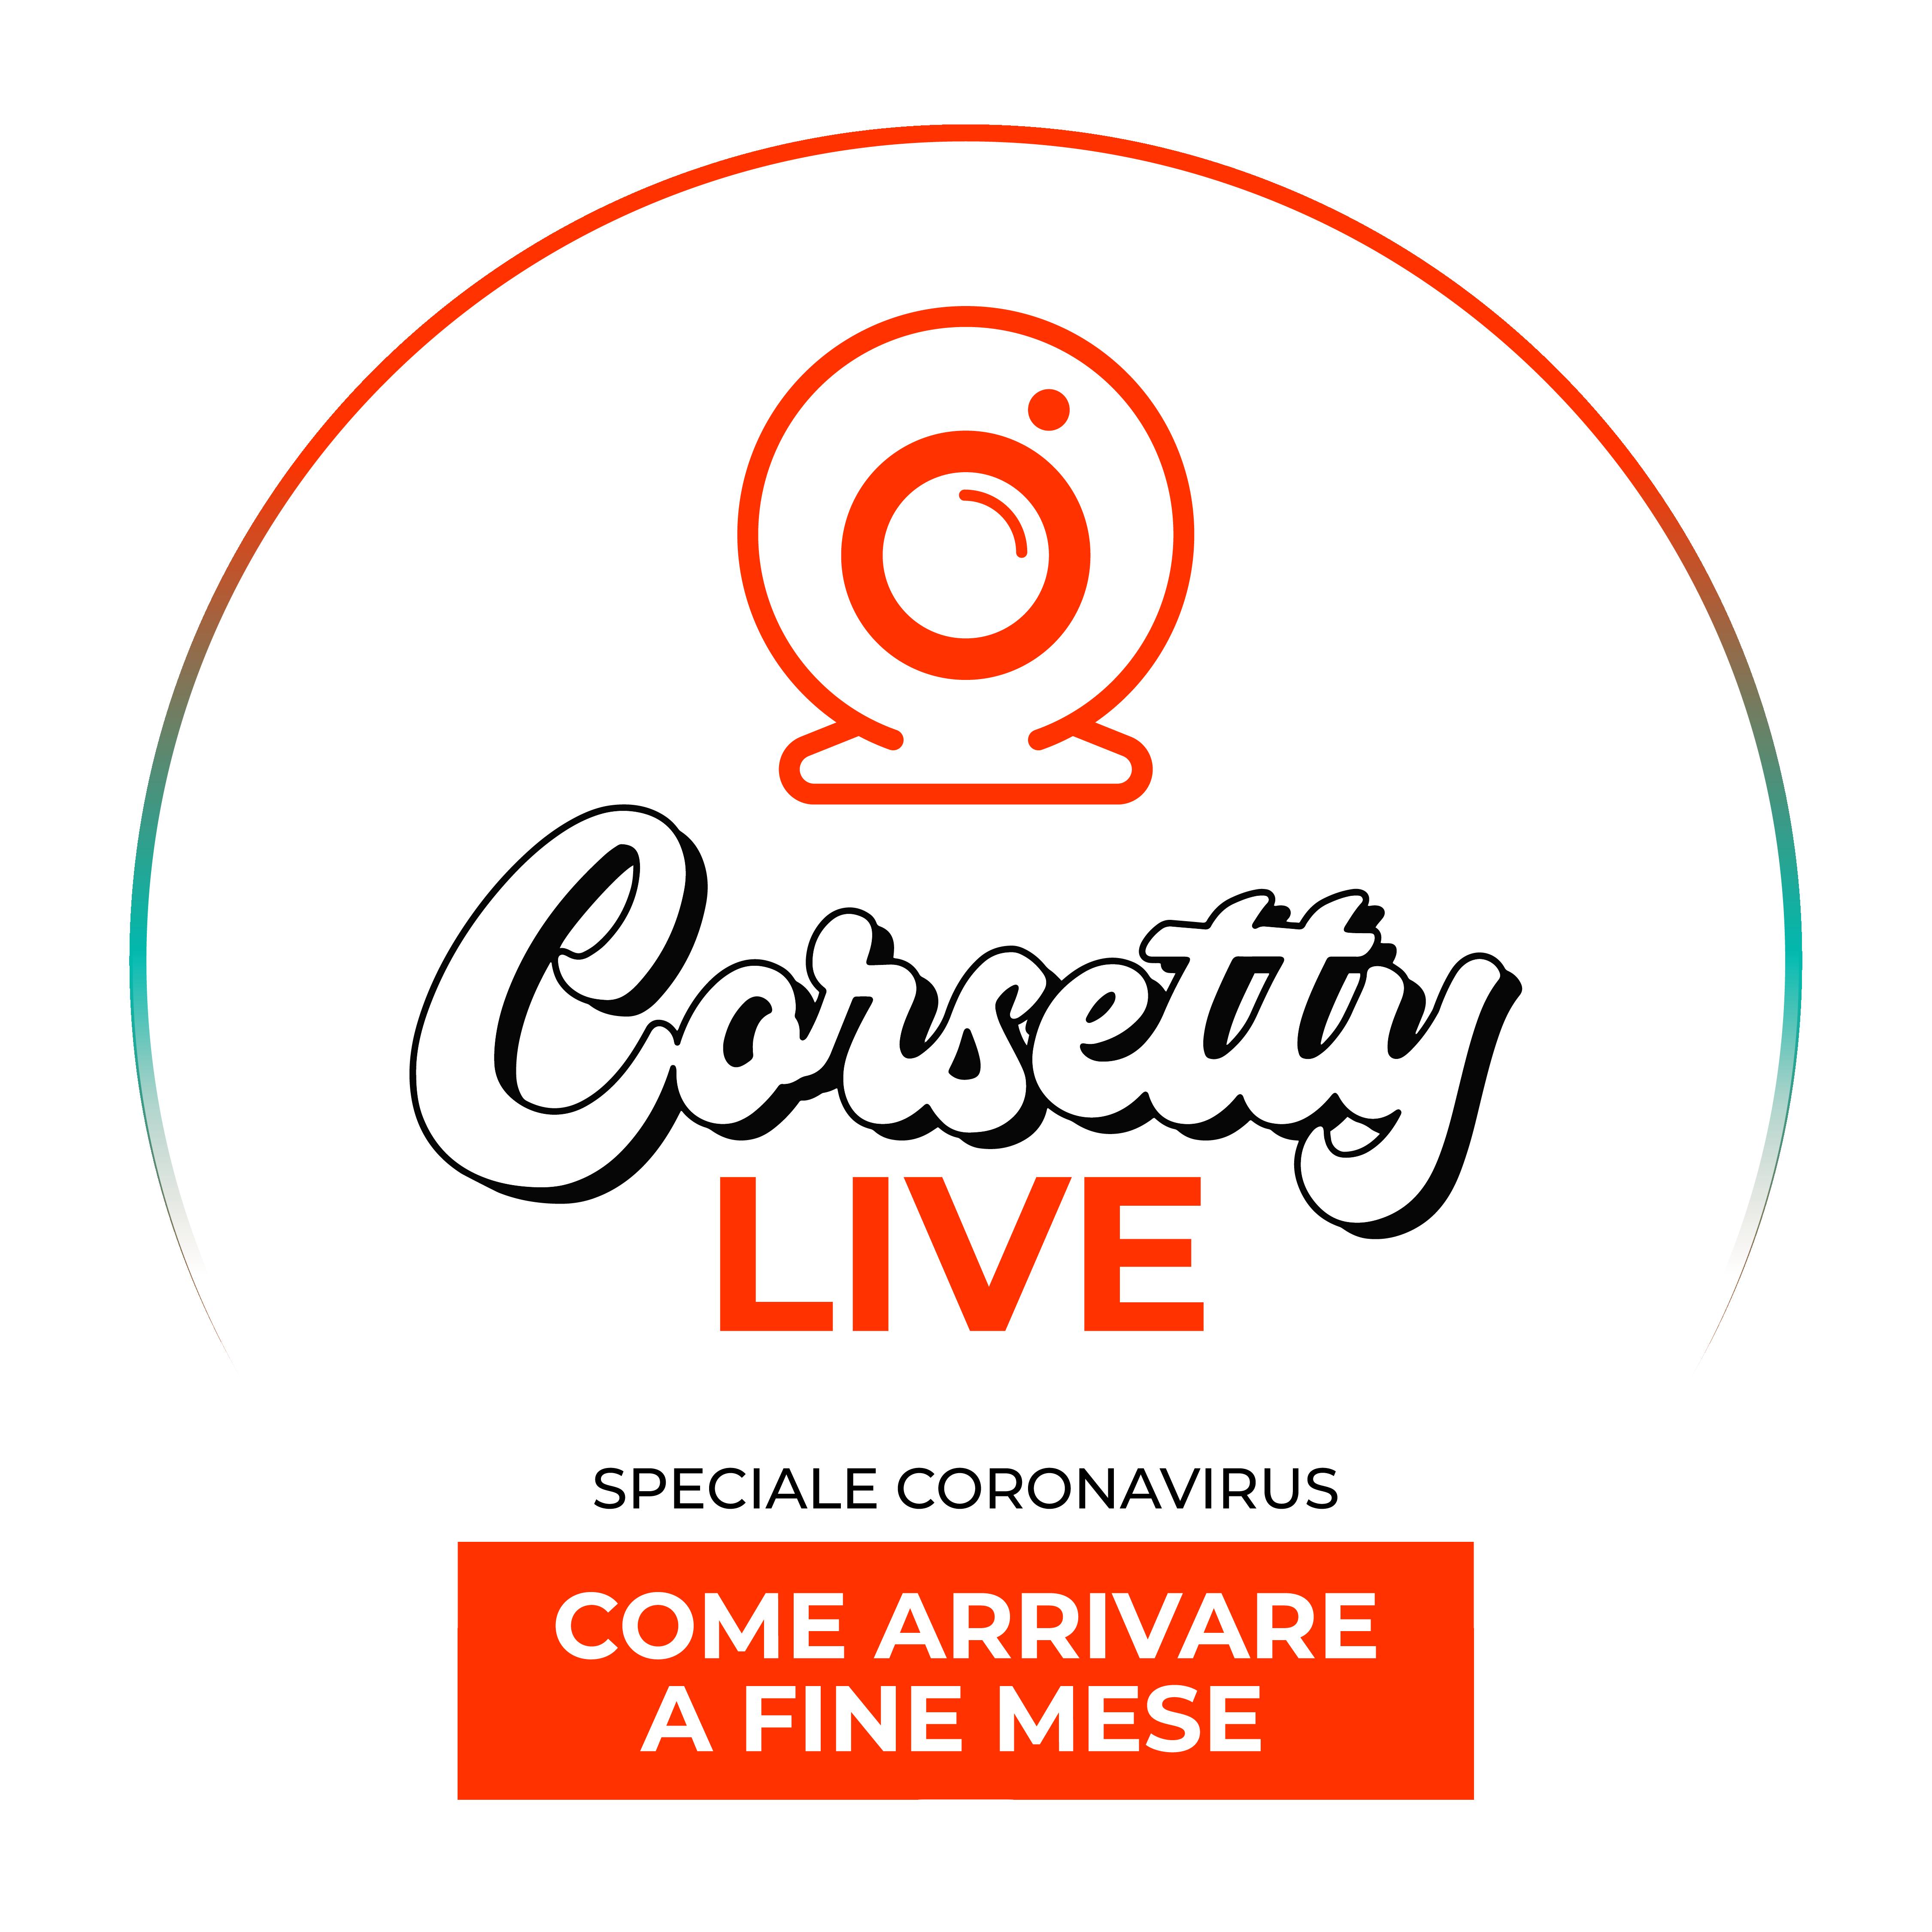 SPECIALE CORONAVIRUS: COME ARRIVARE A FINE MESE